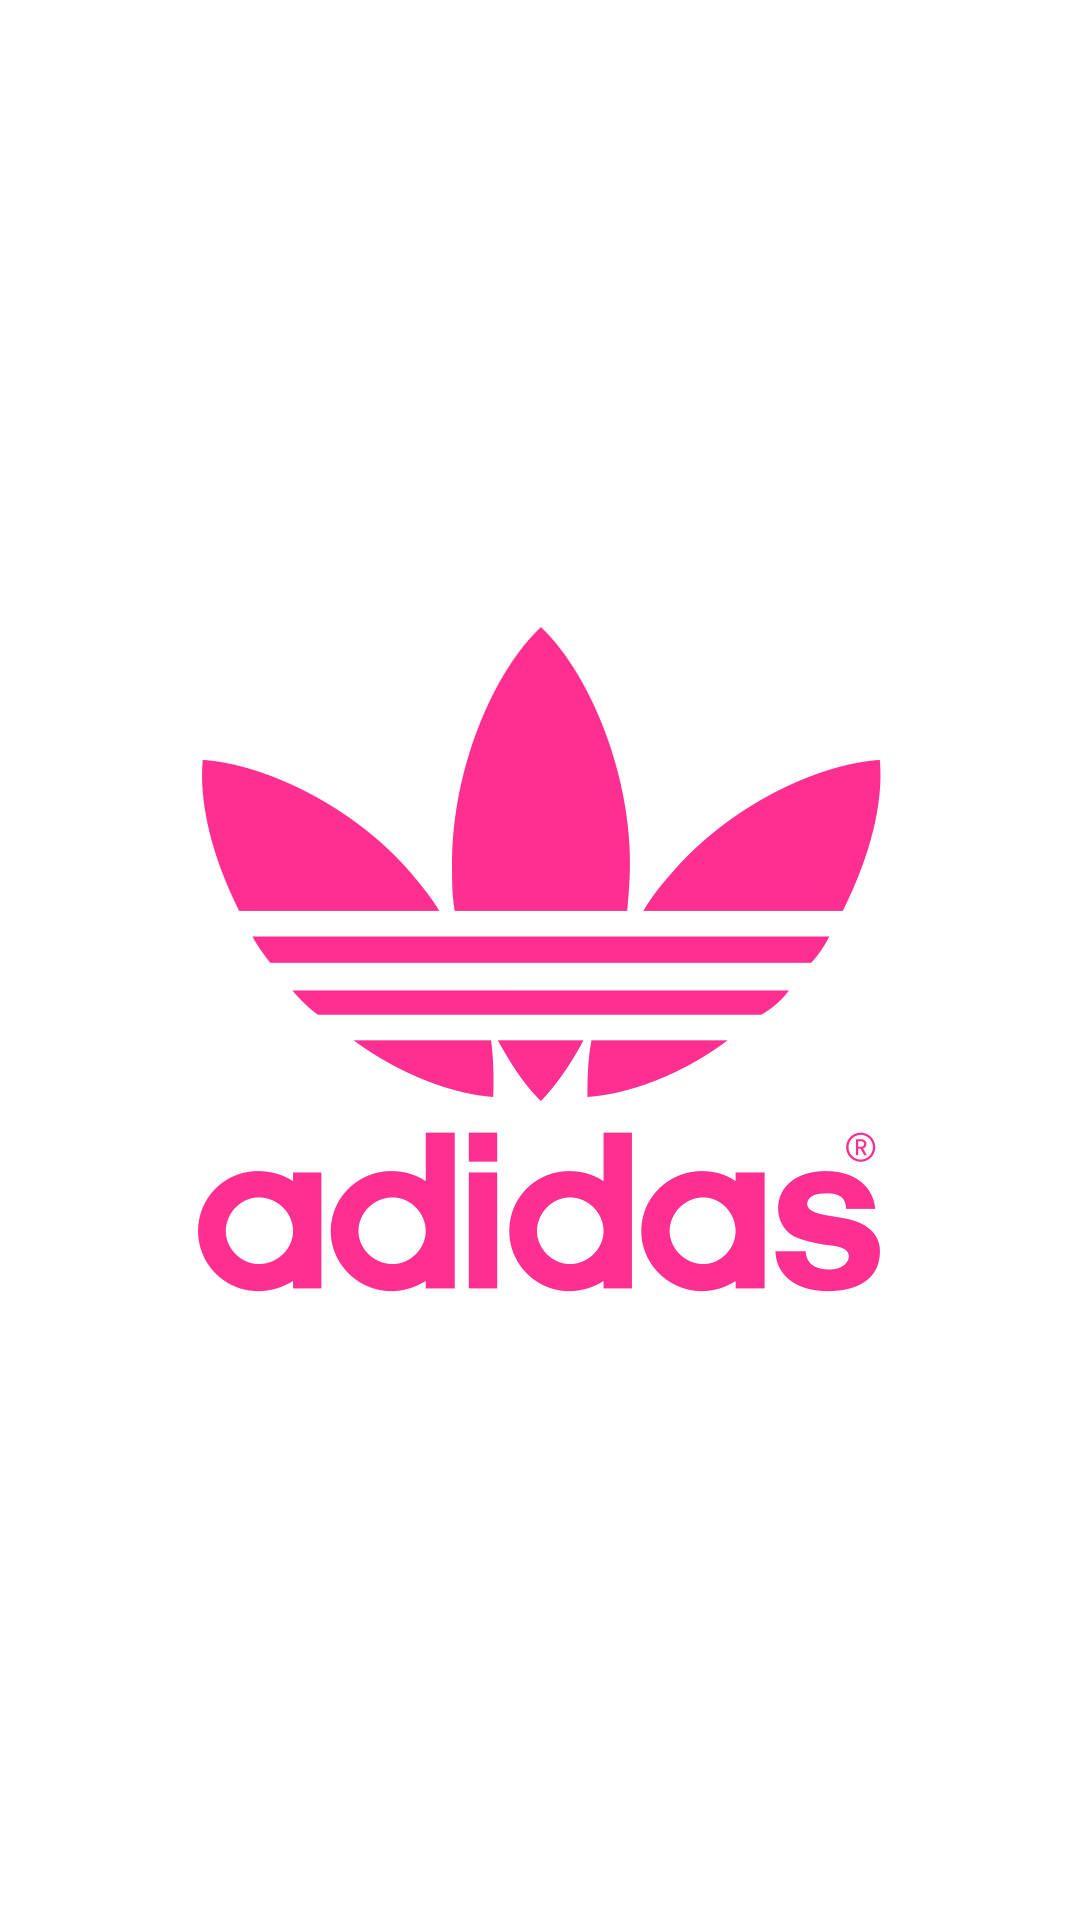 Adidas Logo Iphone Wallpaper アディダス壁紙 アディダス